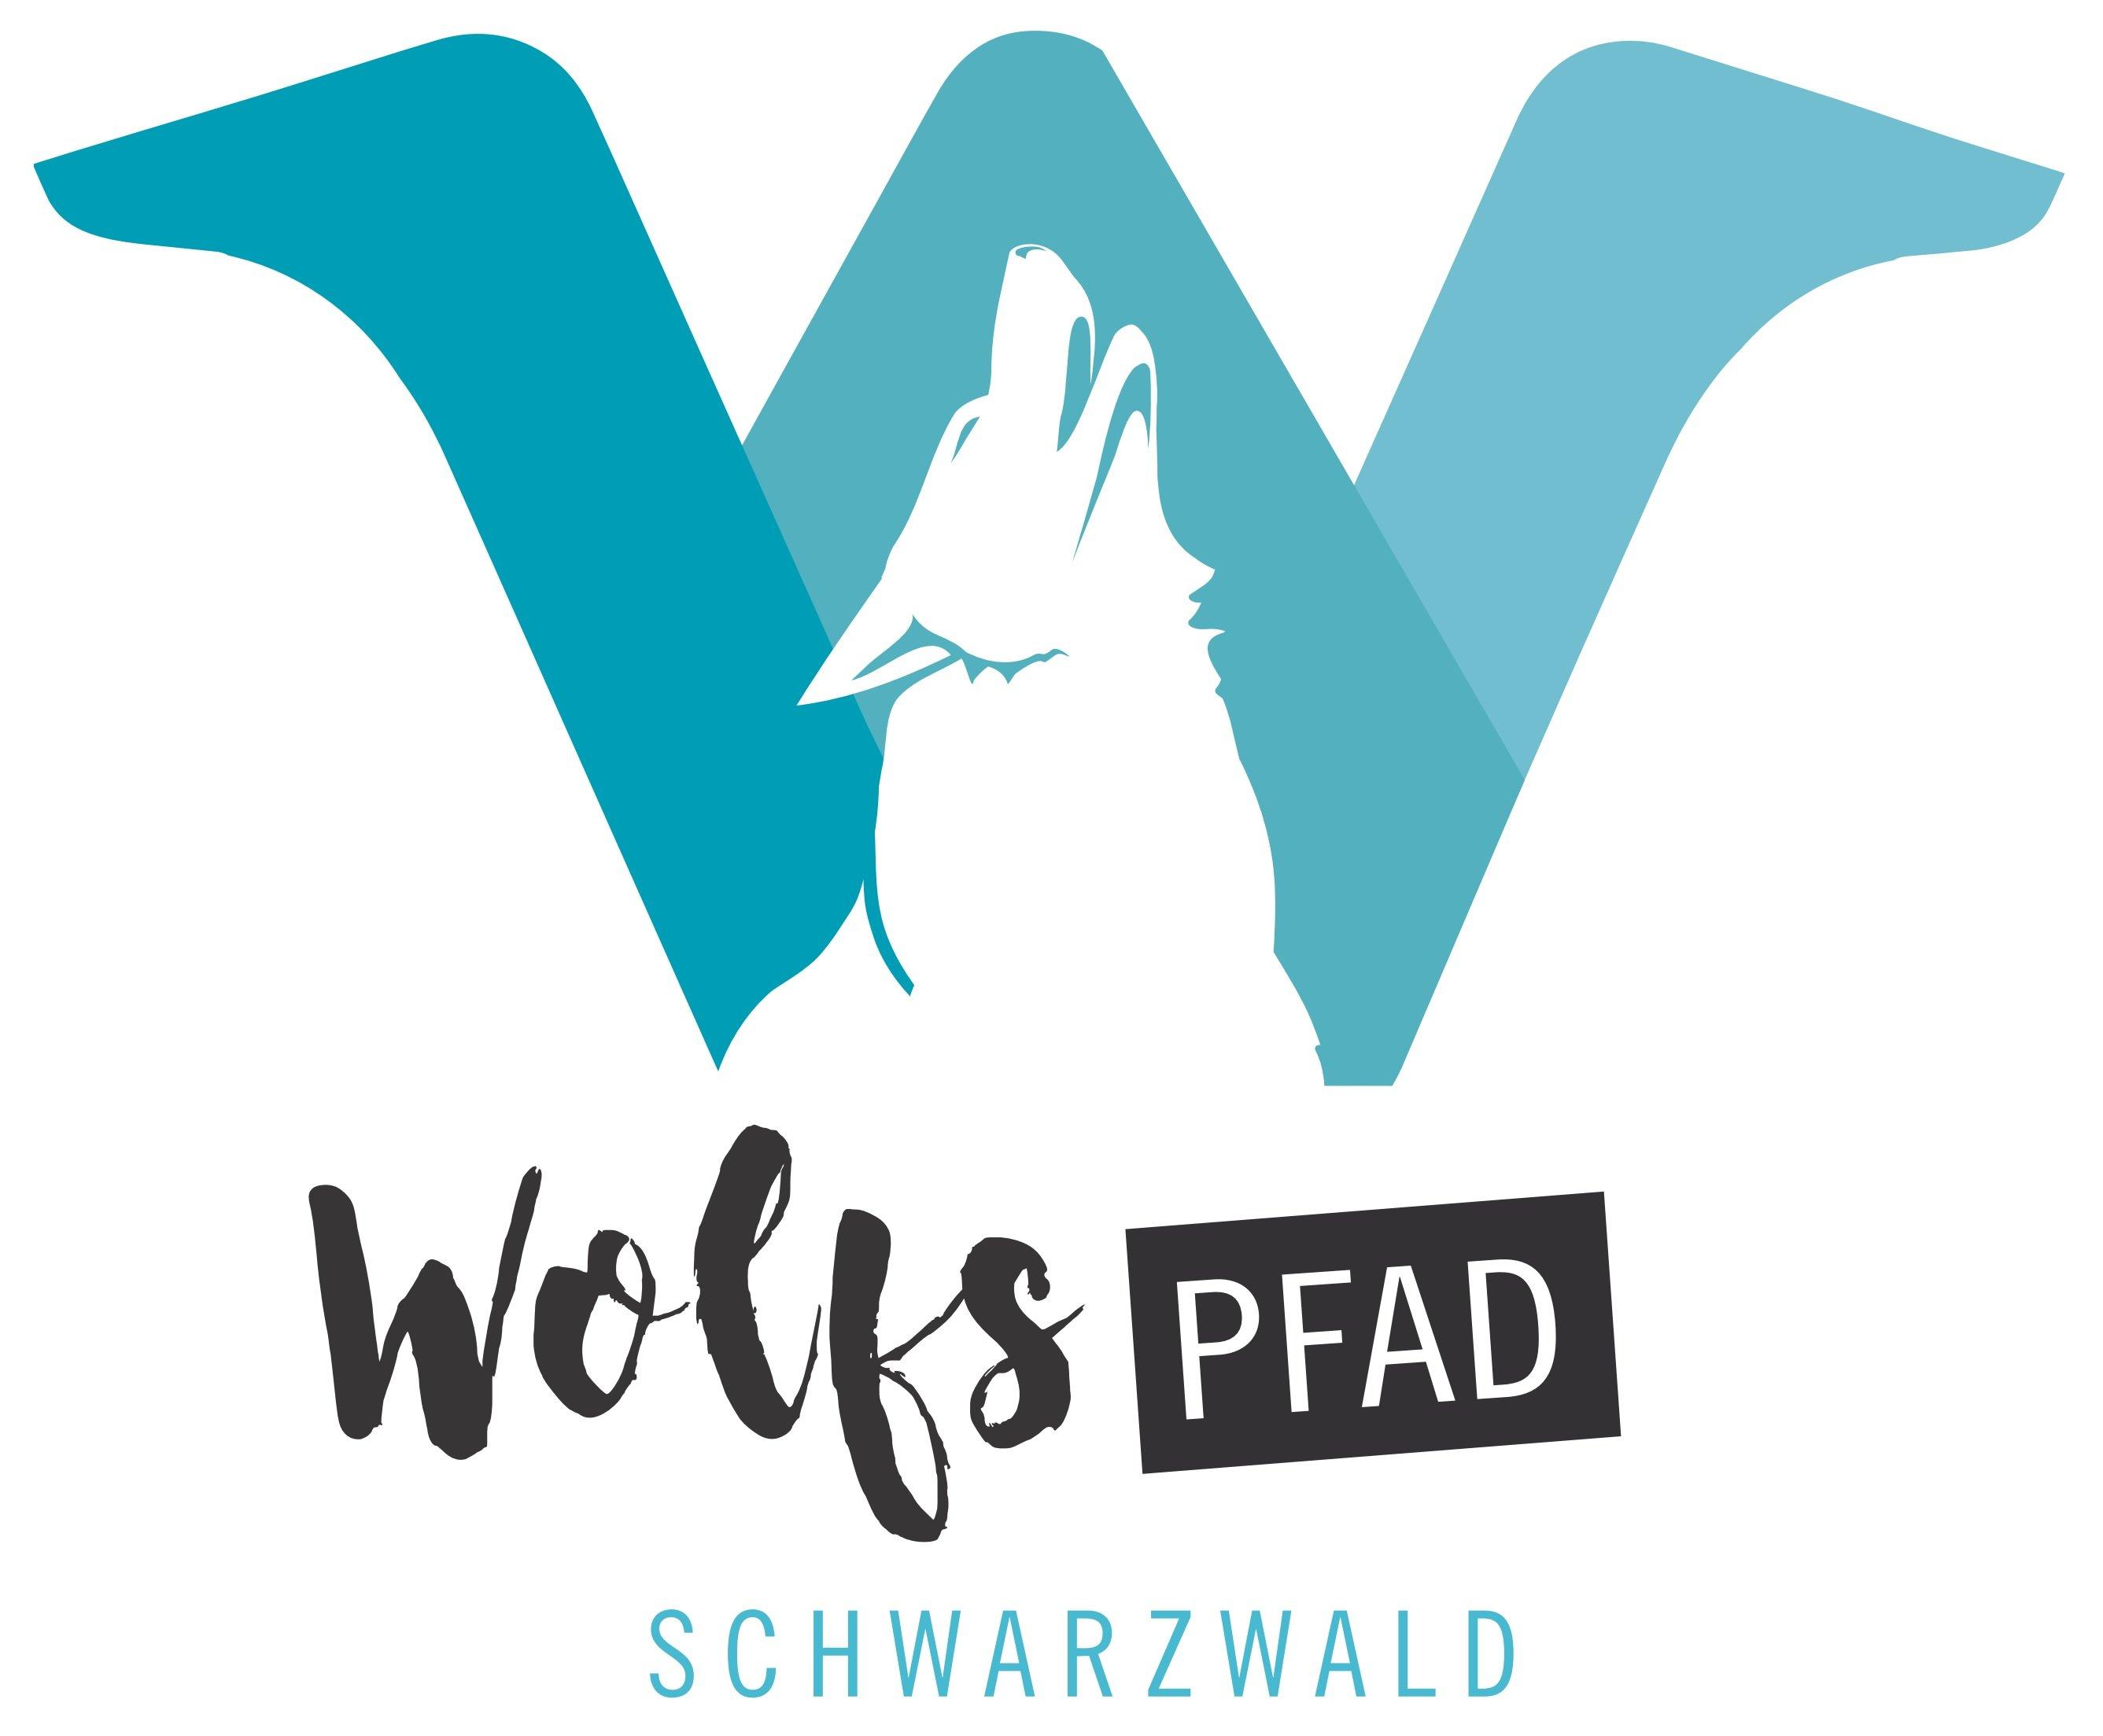 Wolfspfad-Logo